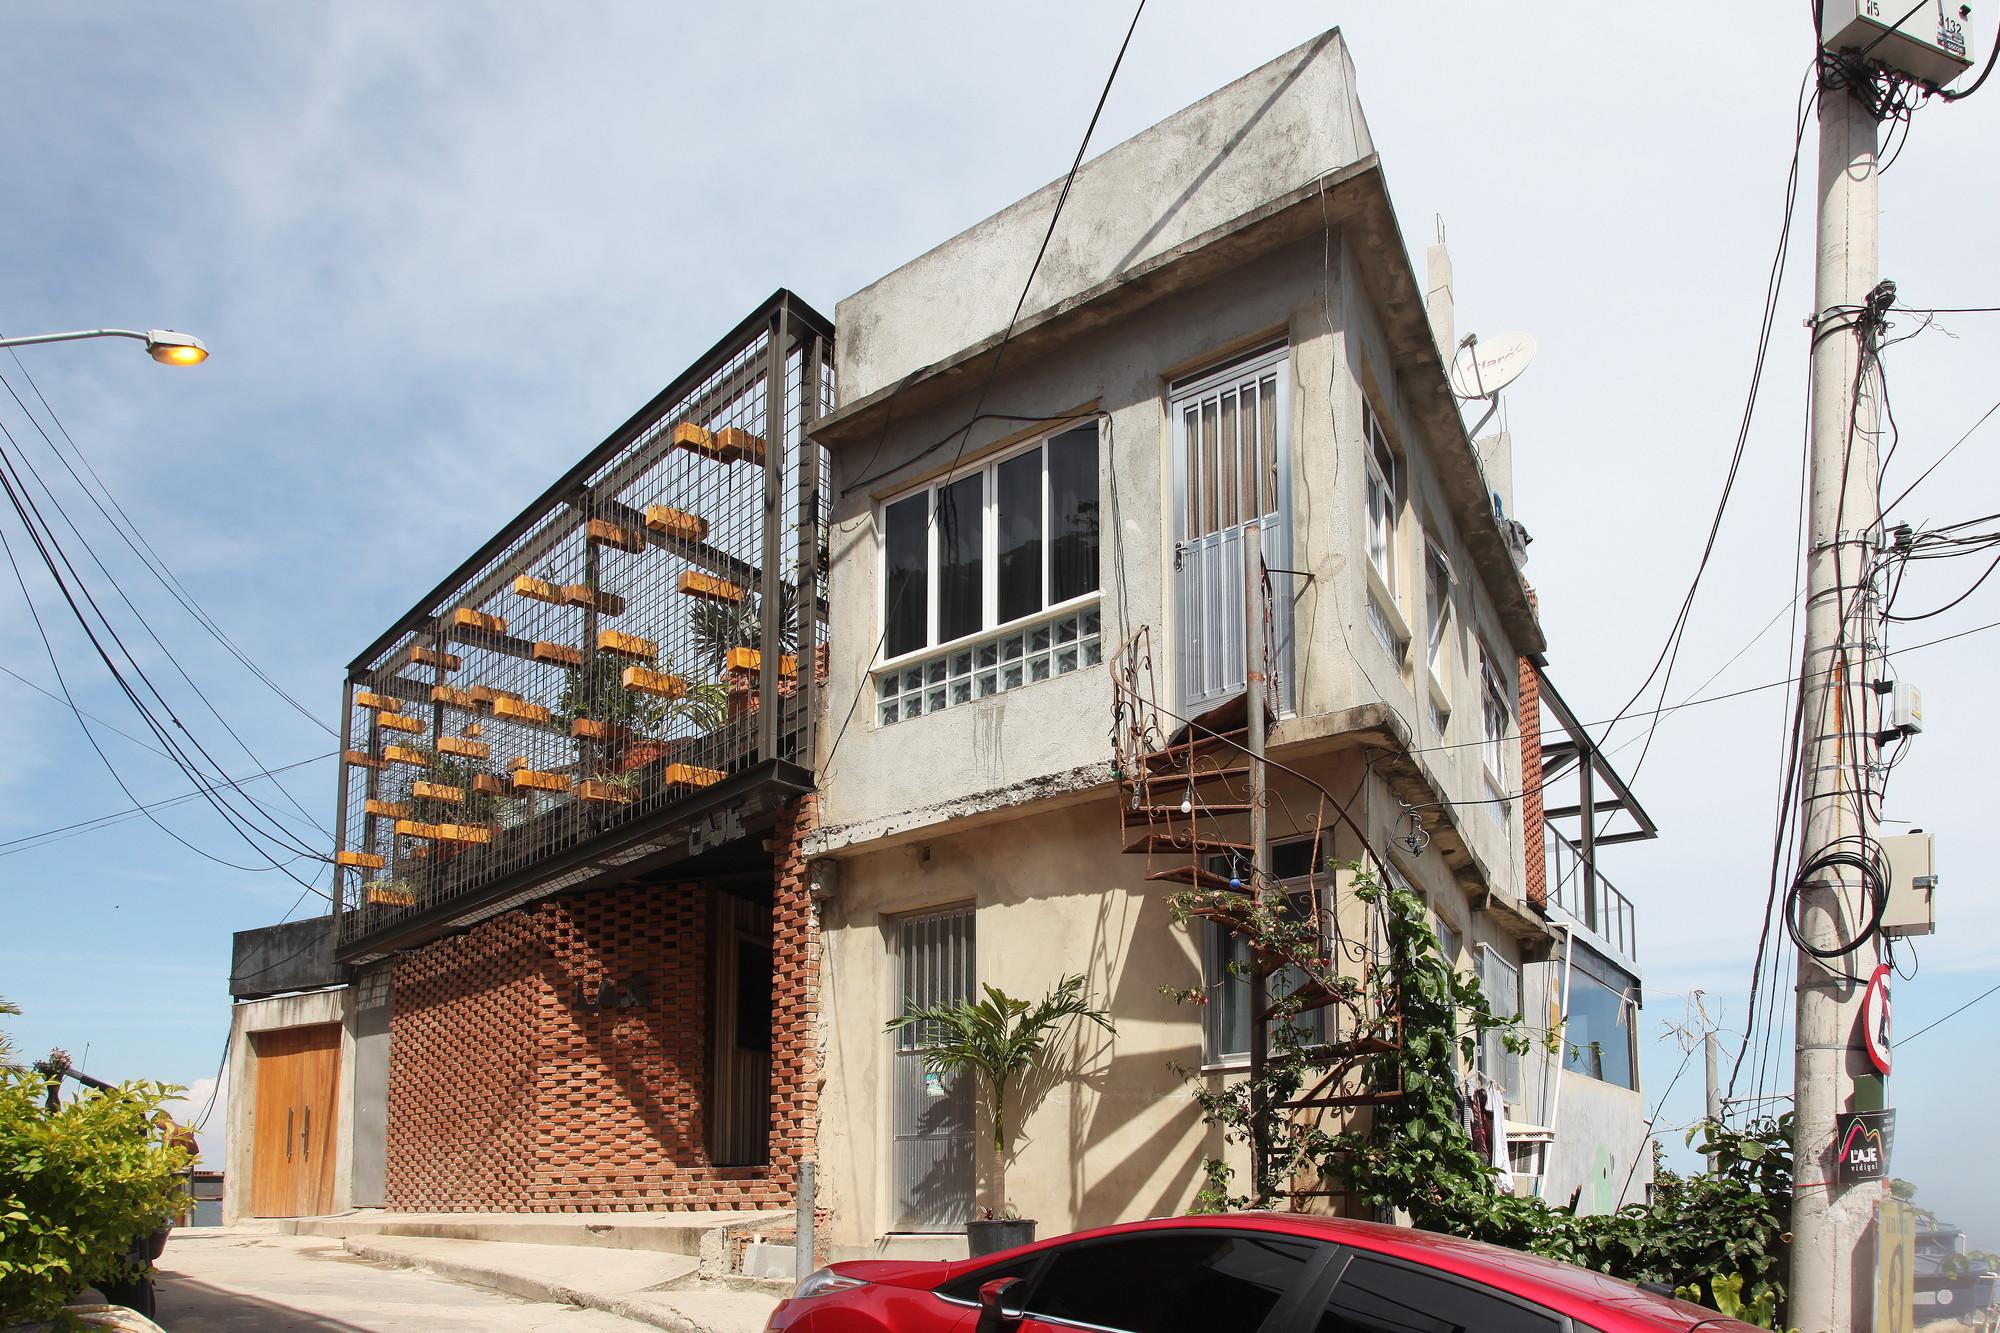 Galeria de Bar da Laje / OYAPOCK architectes - 1